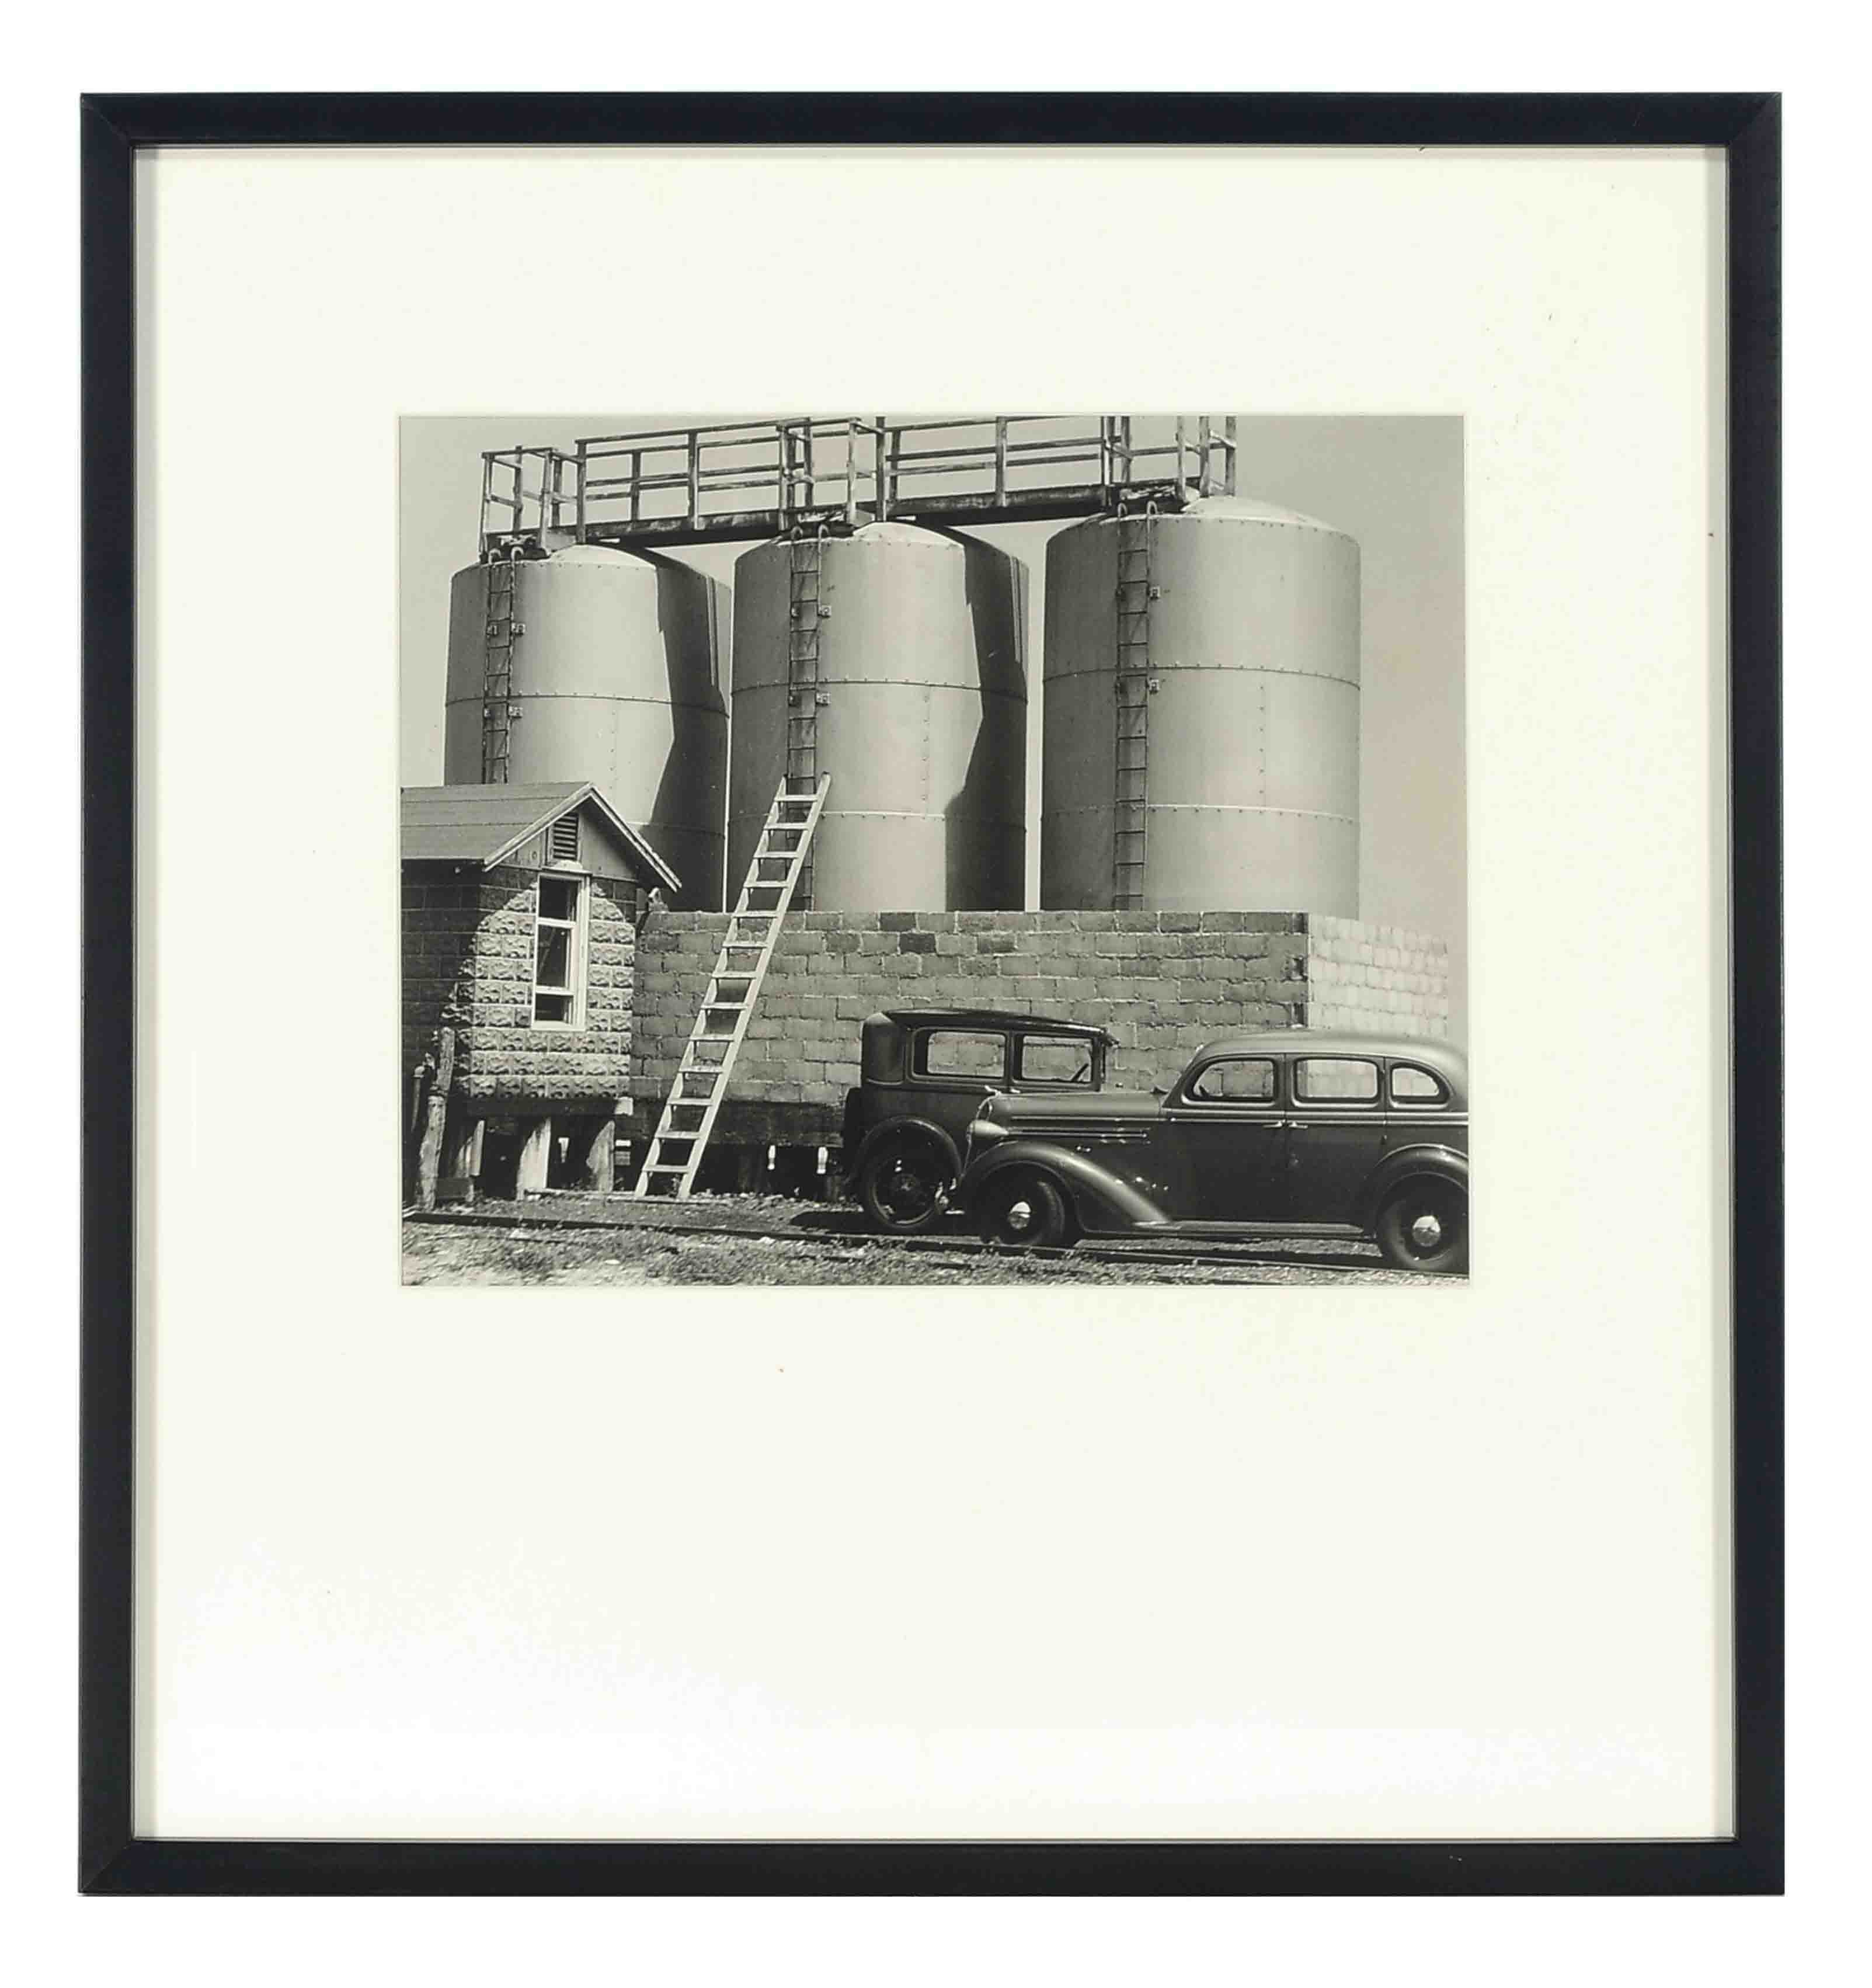 Untitled (Three silos), circa 1930s